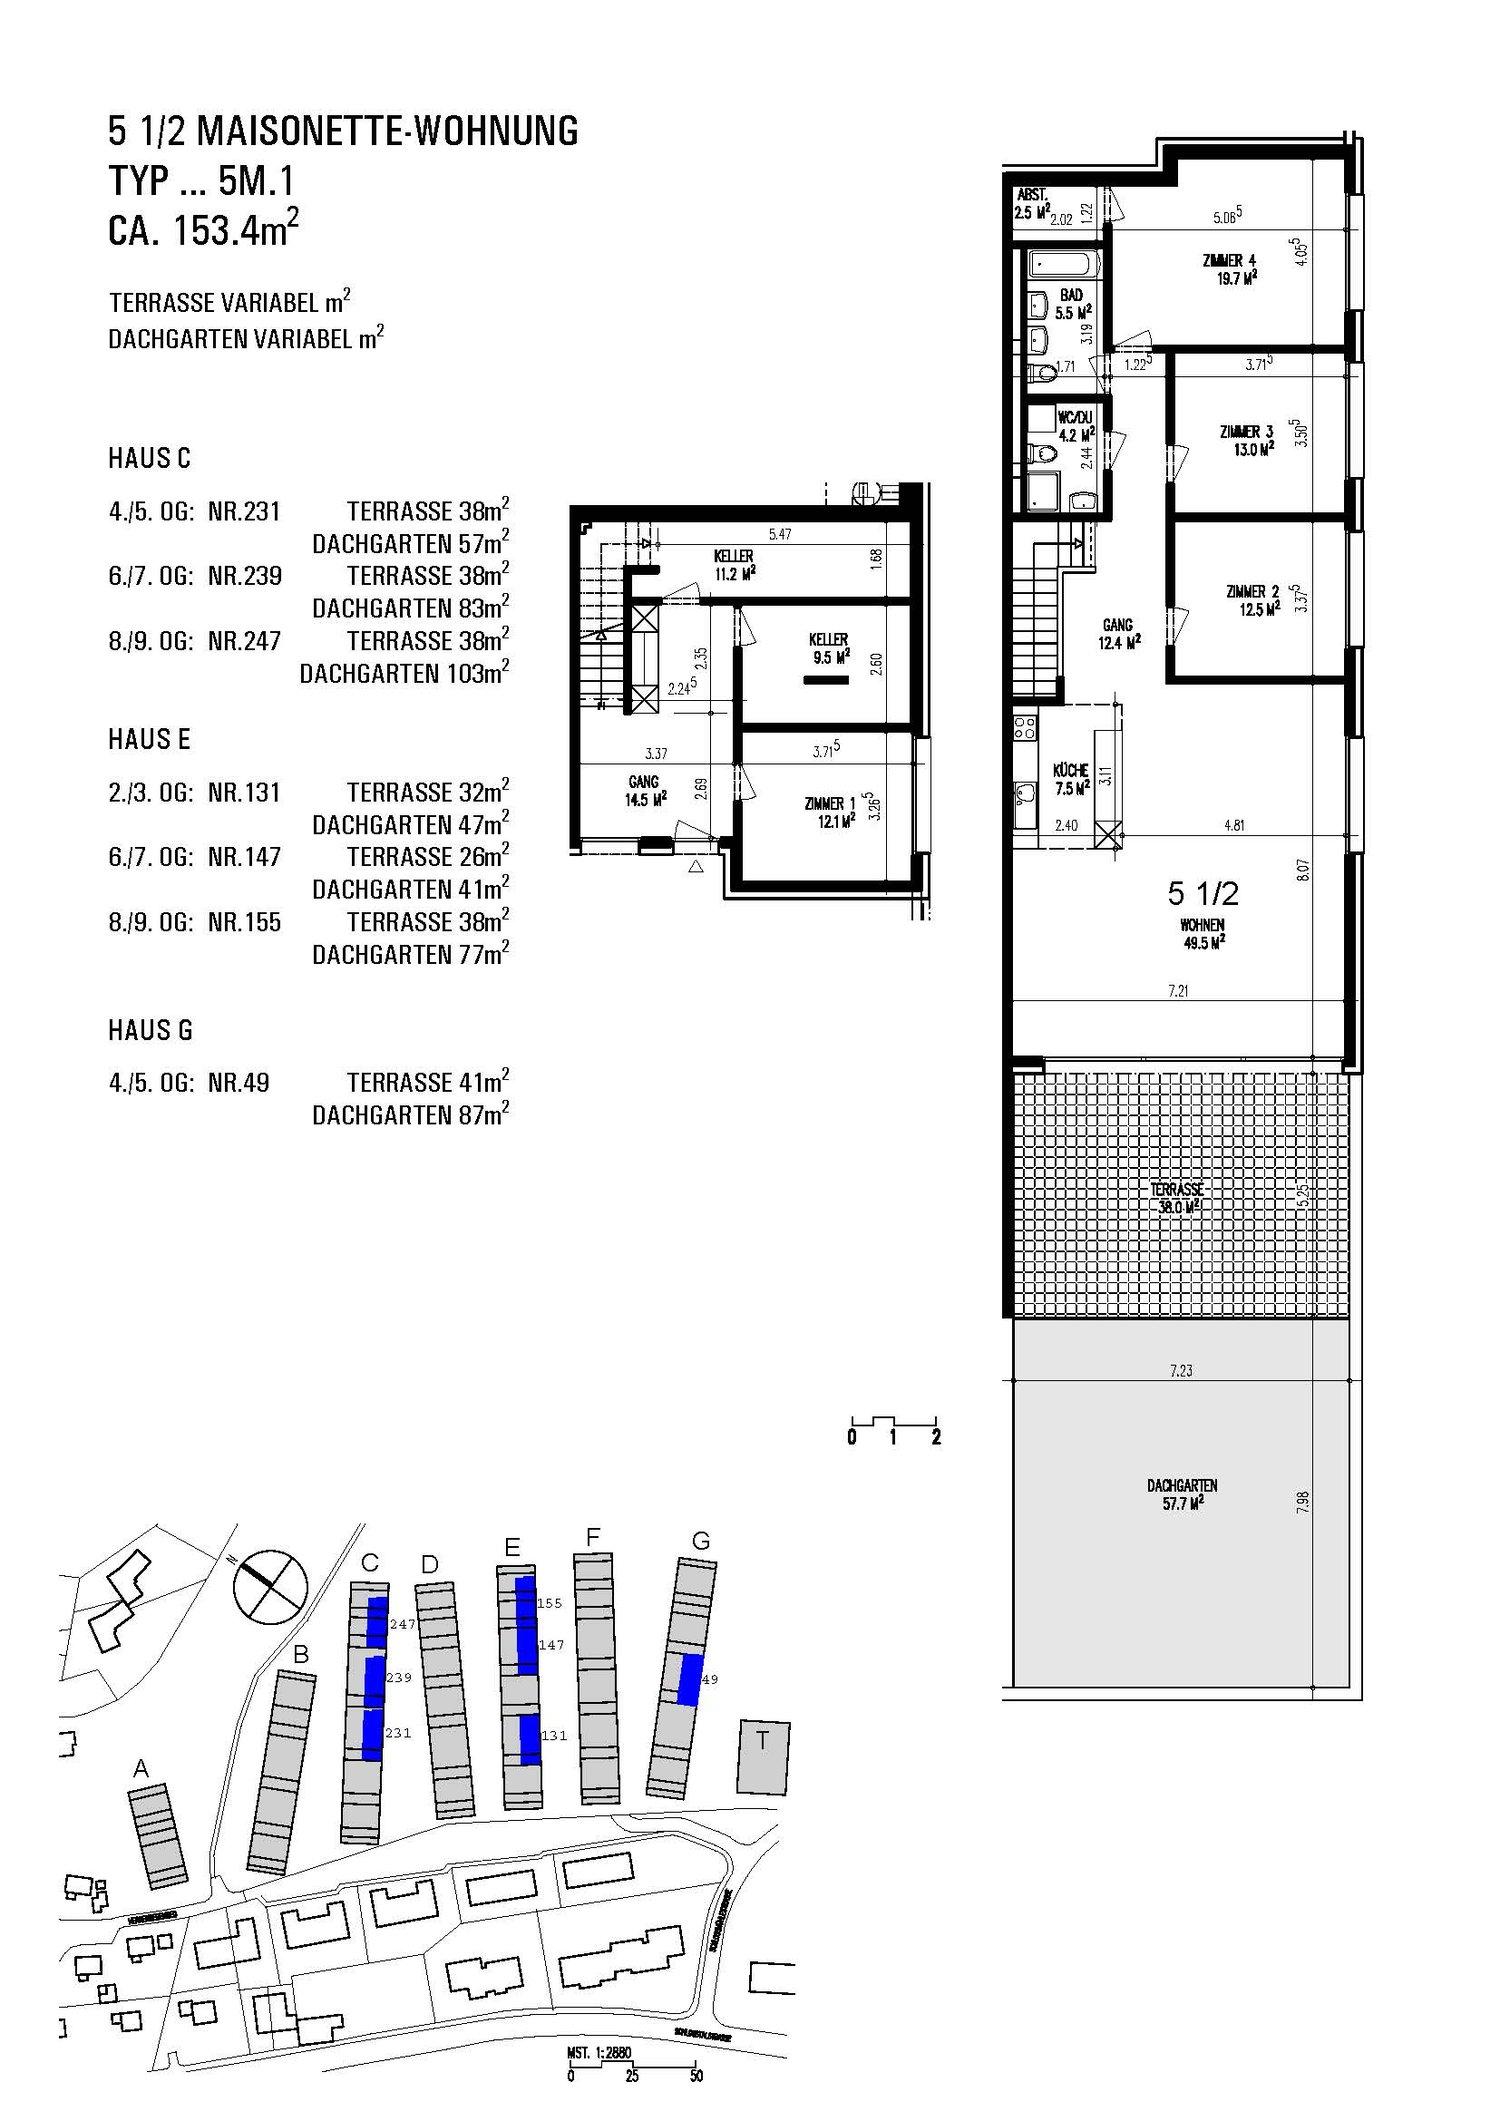 Schlossmühlestr. 213-257